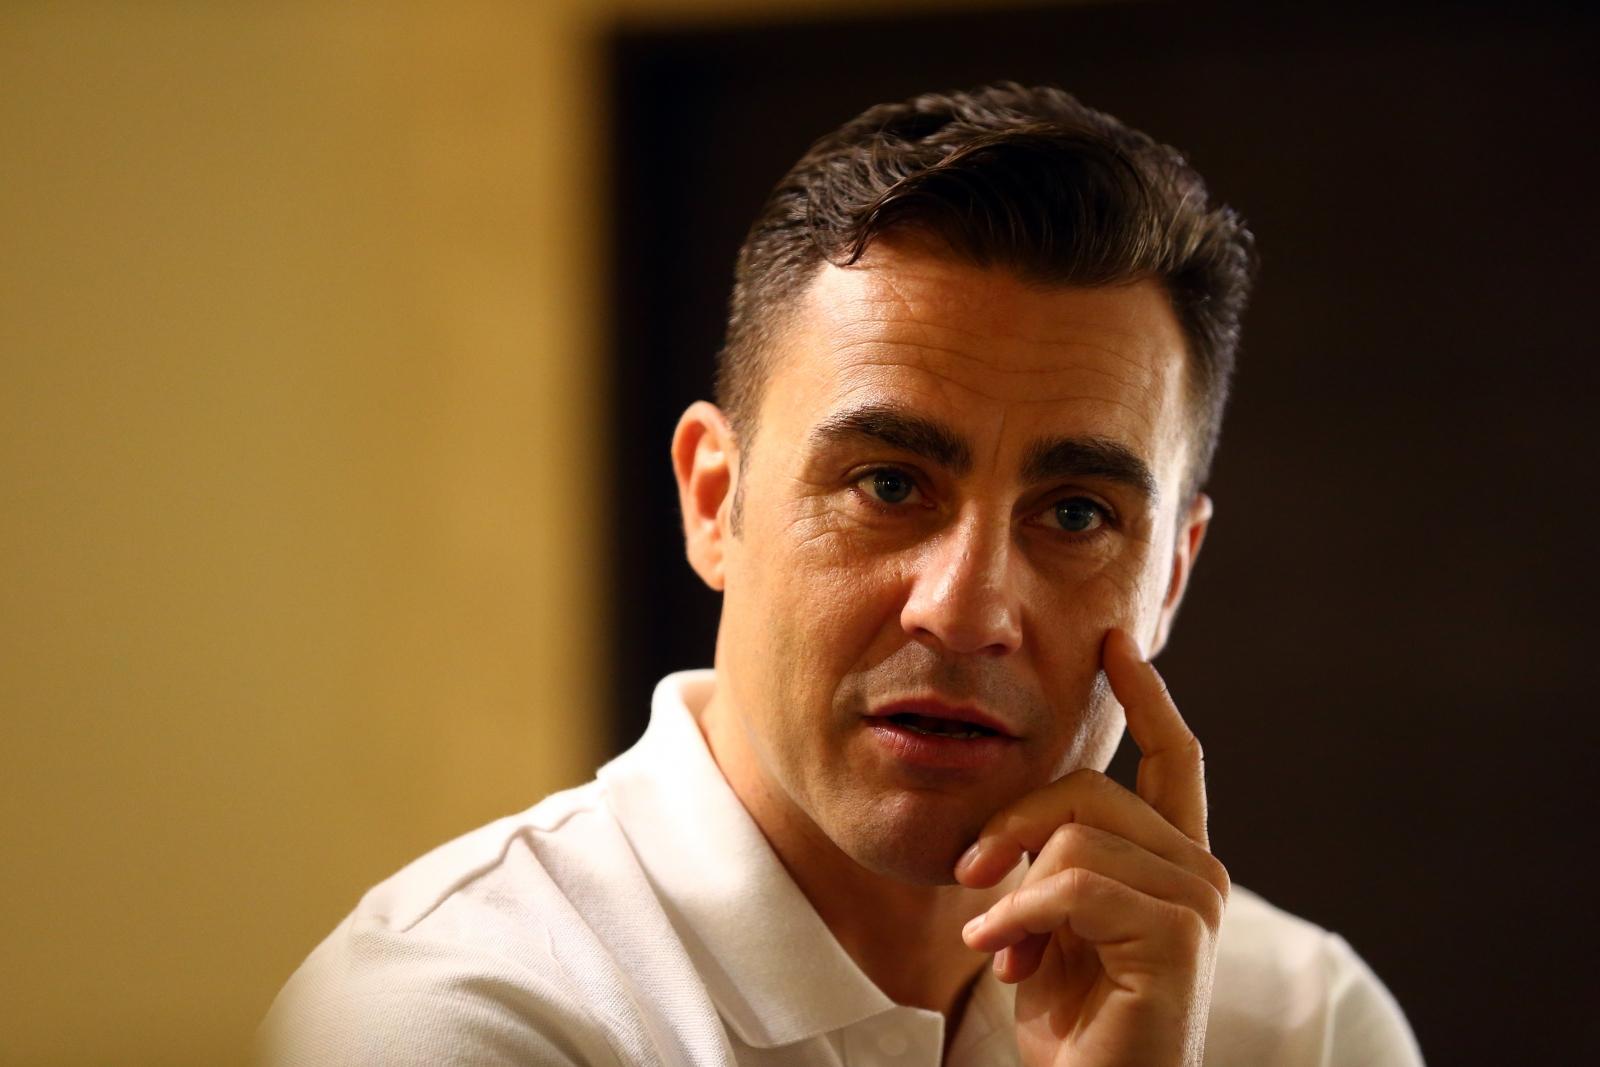 Fabio Cannavaro has been handed a prison sentence in Italy